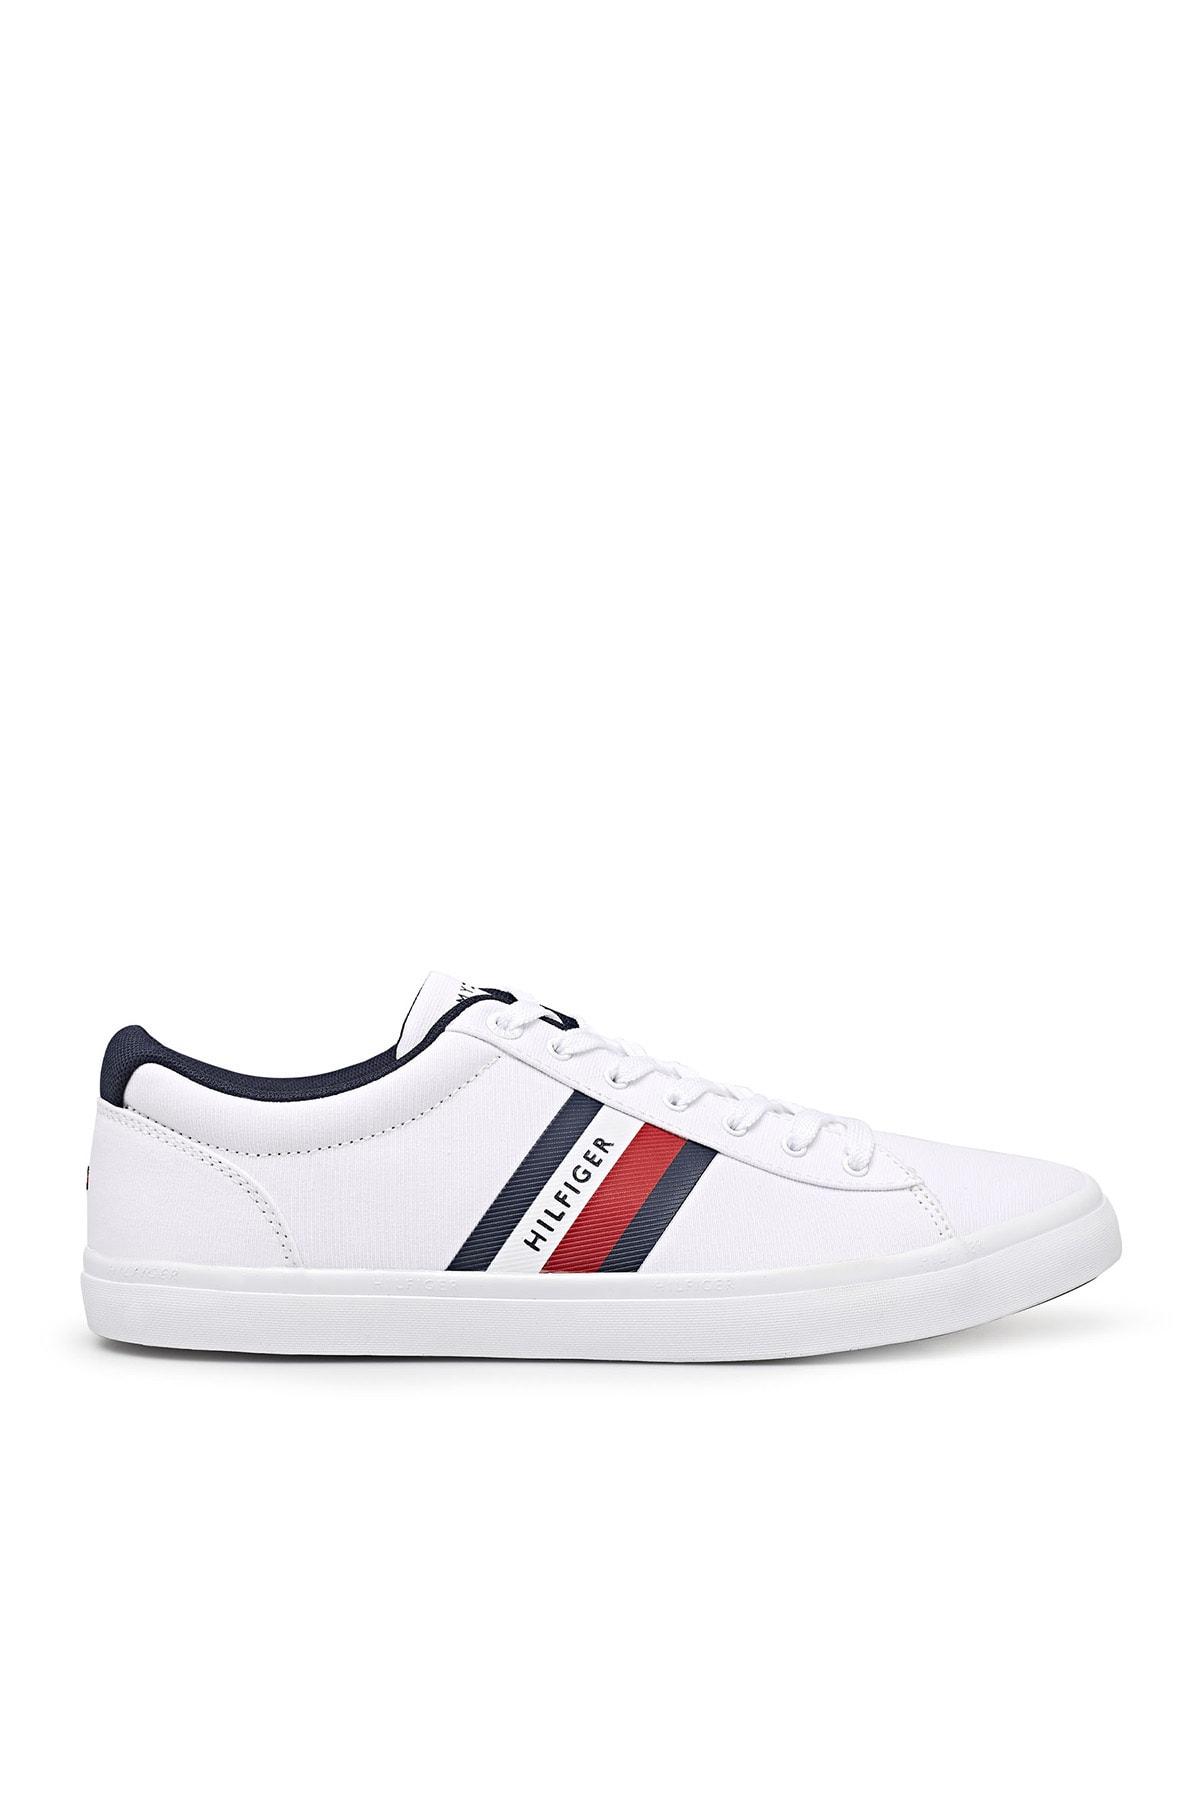 Tommy Hilfiger Erkek Beyaz Sneaker Ayakkabı Fm0fm03389 Ybr 1